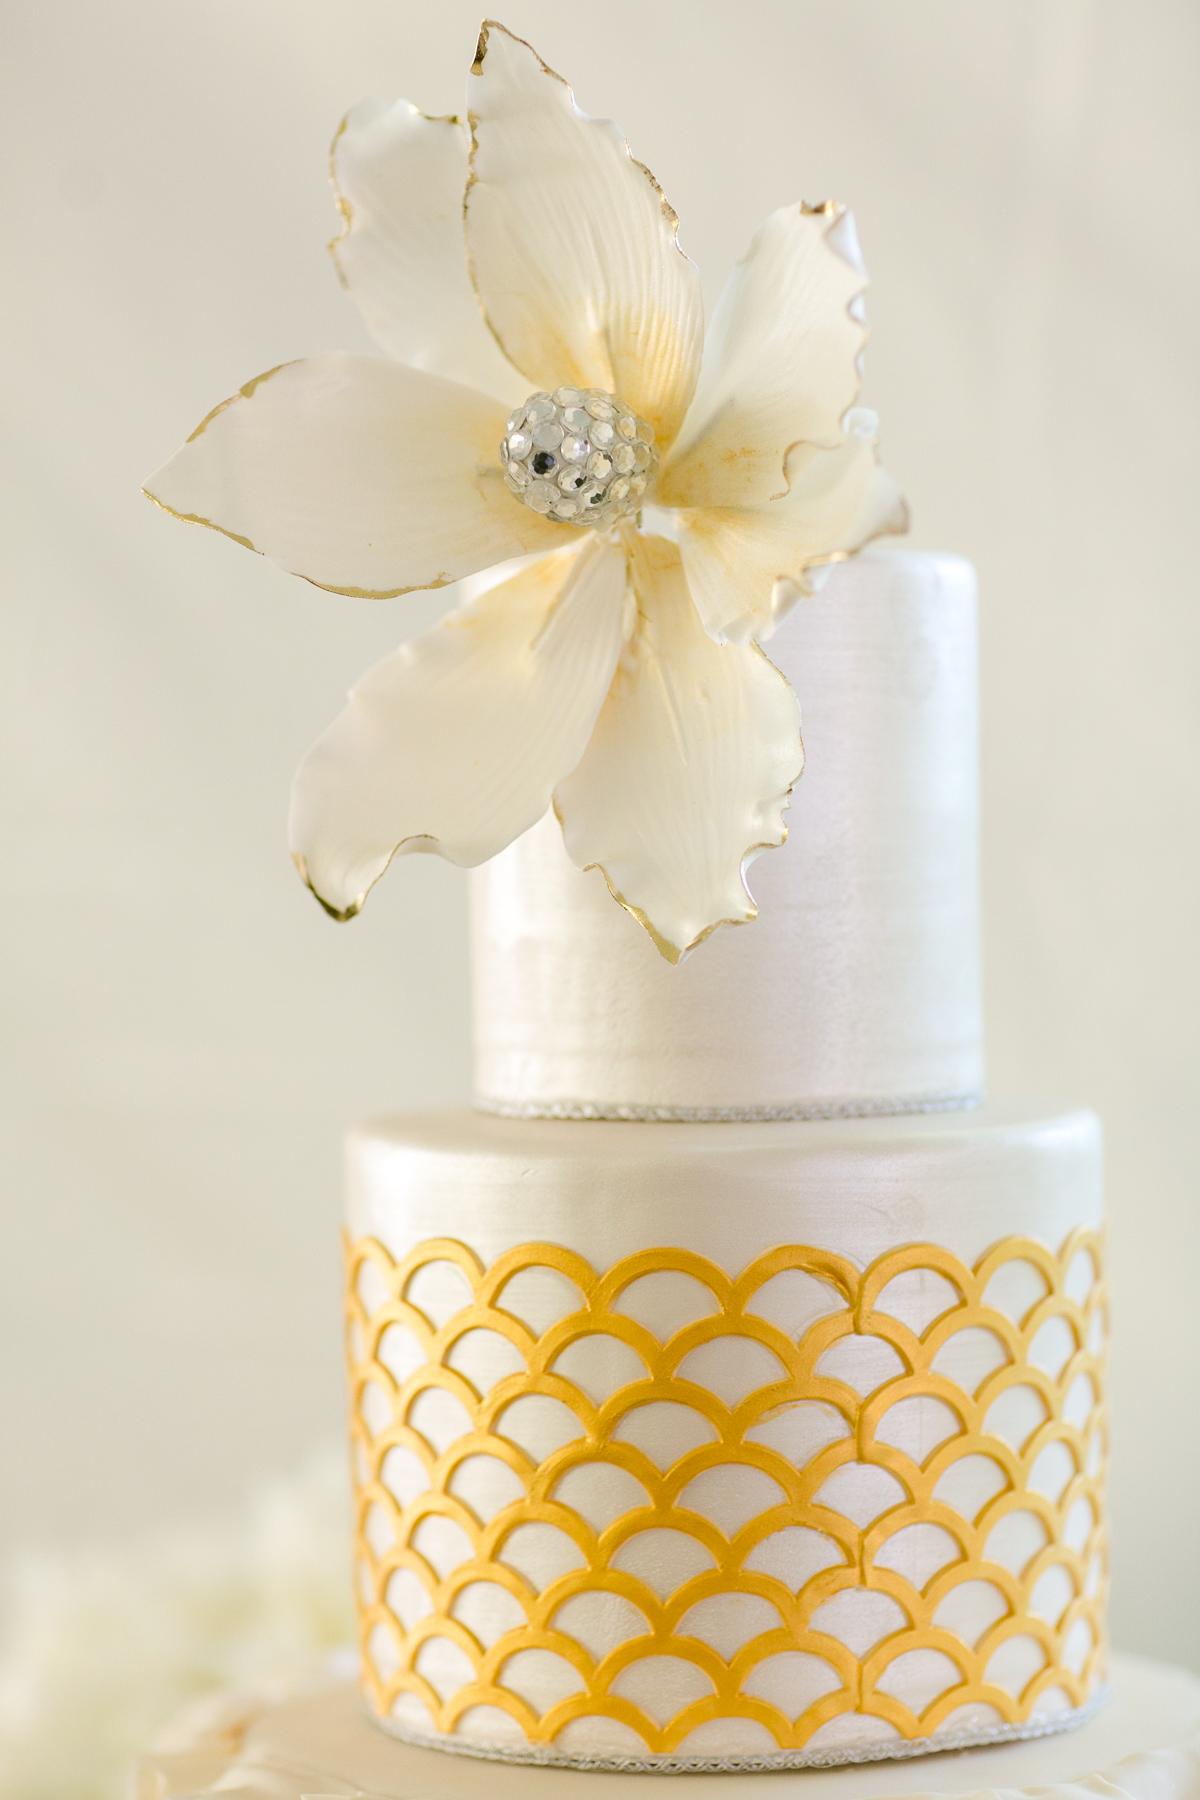 Gold and White Wedding Cake - Elizabeth Anne Designs: The Wedding Blog